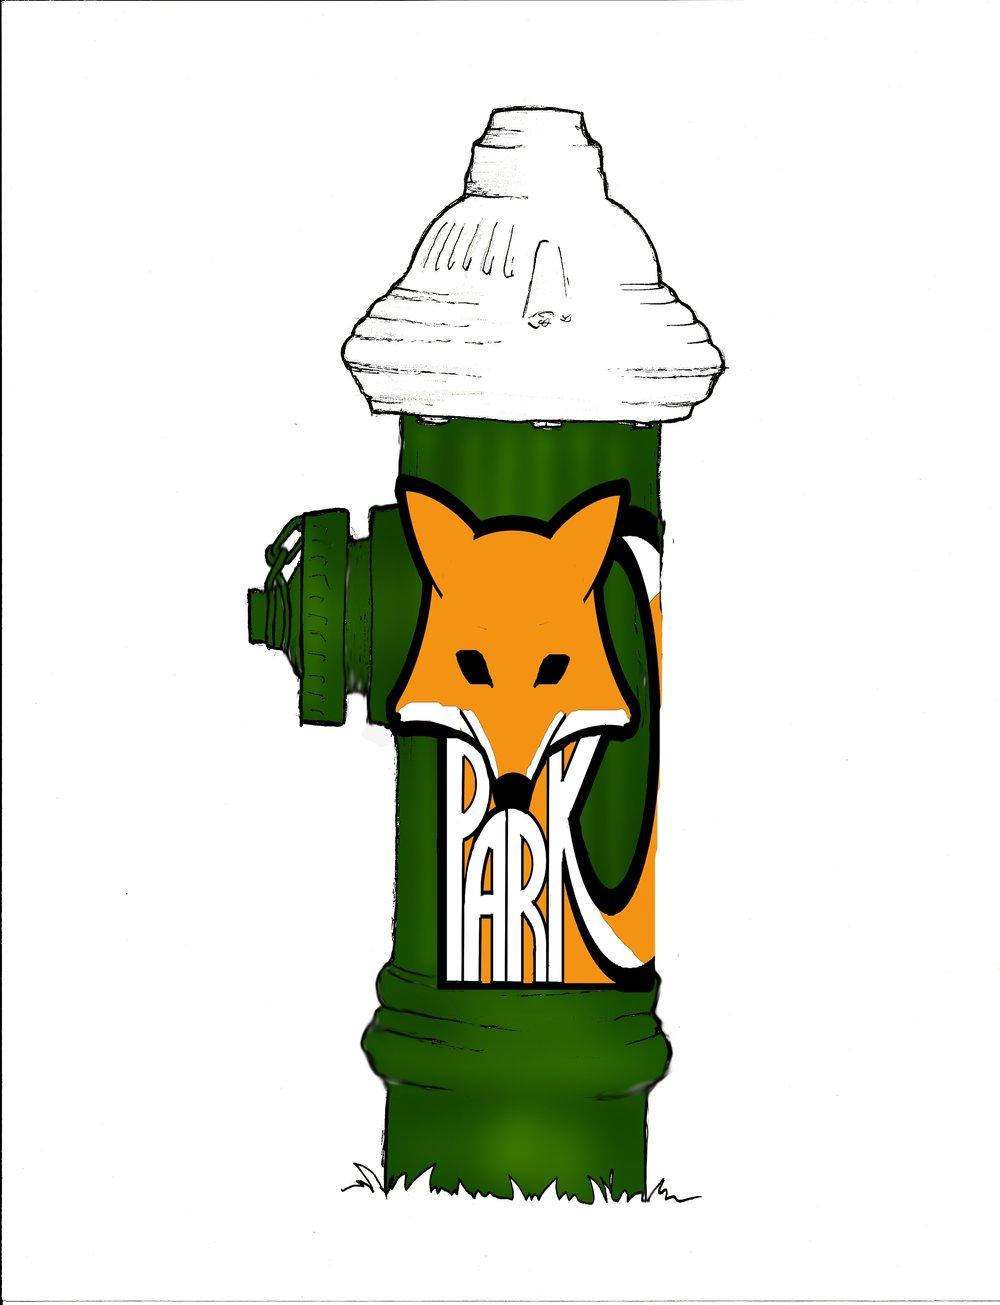 fox park hydrant.jpg